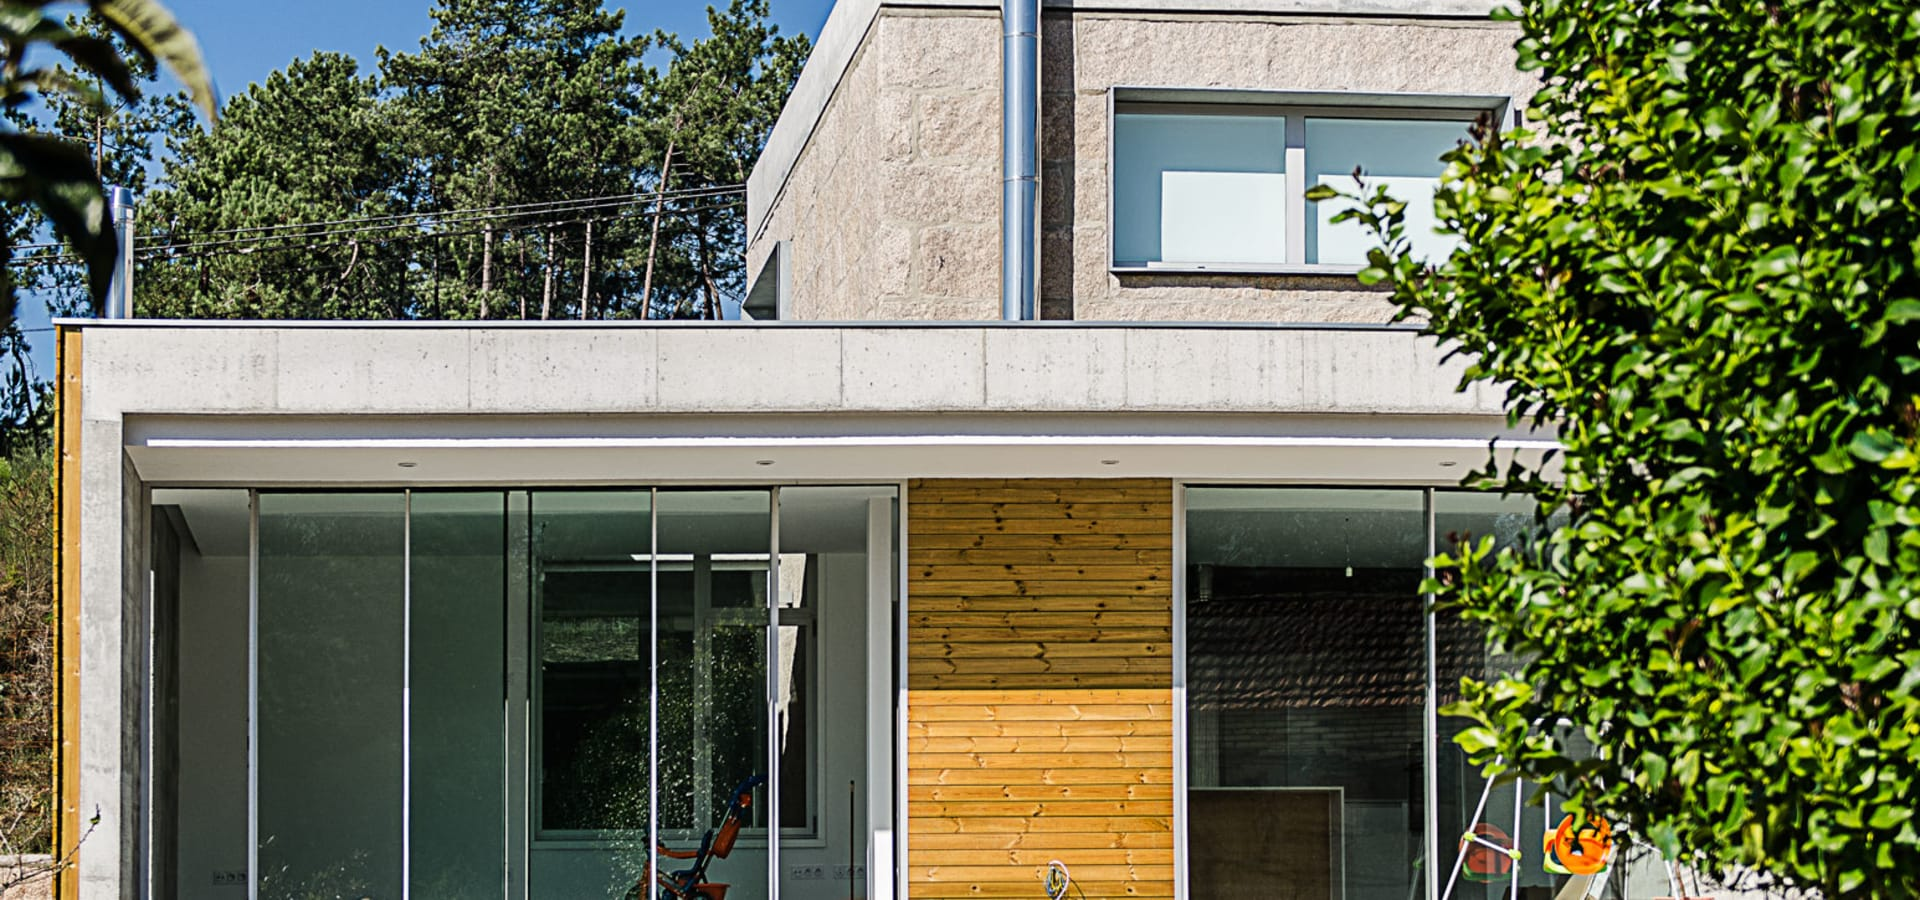 Fern ndez luna oficina de arquitectura scp arquitectos en - Arquitectos en santiago de compostela ...